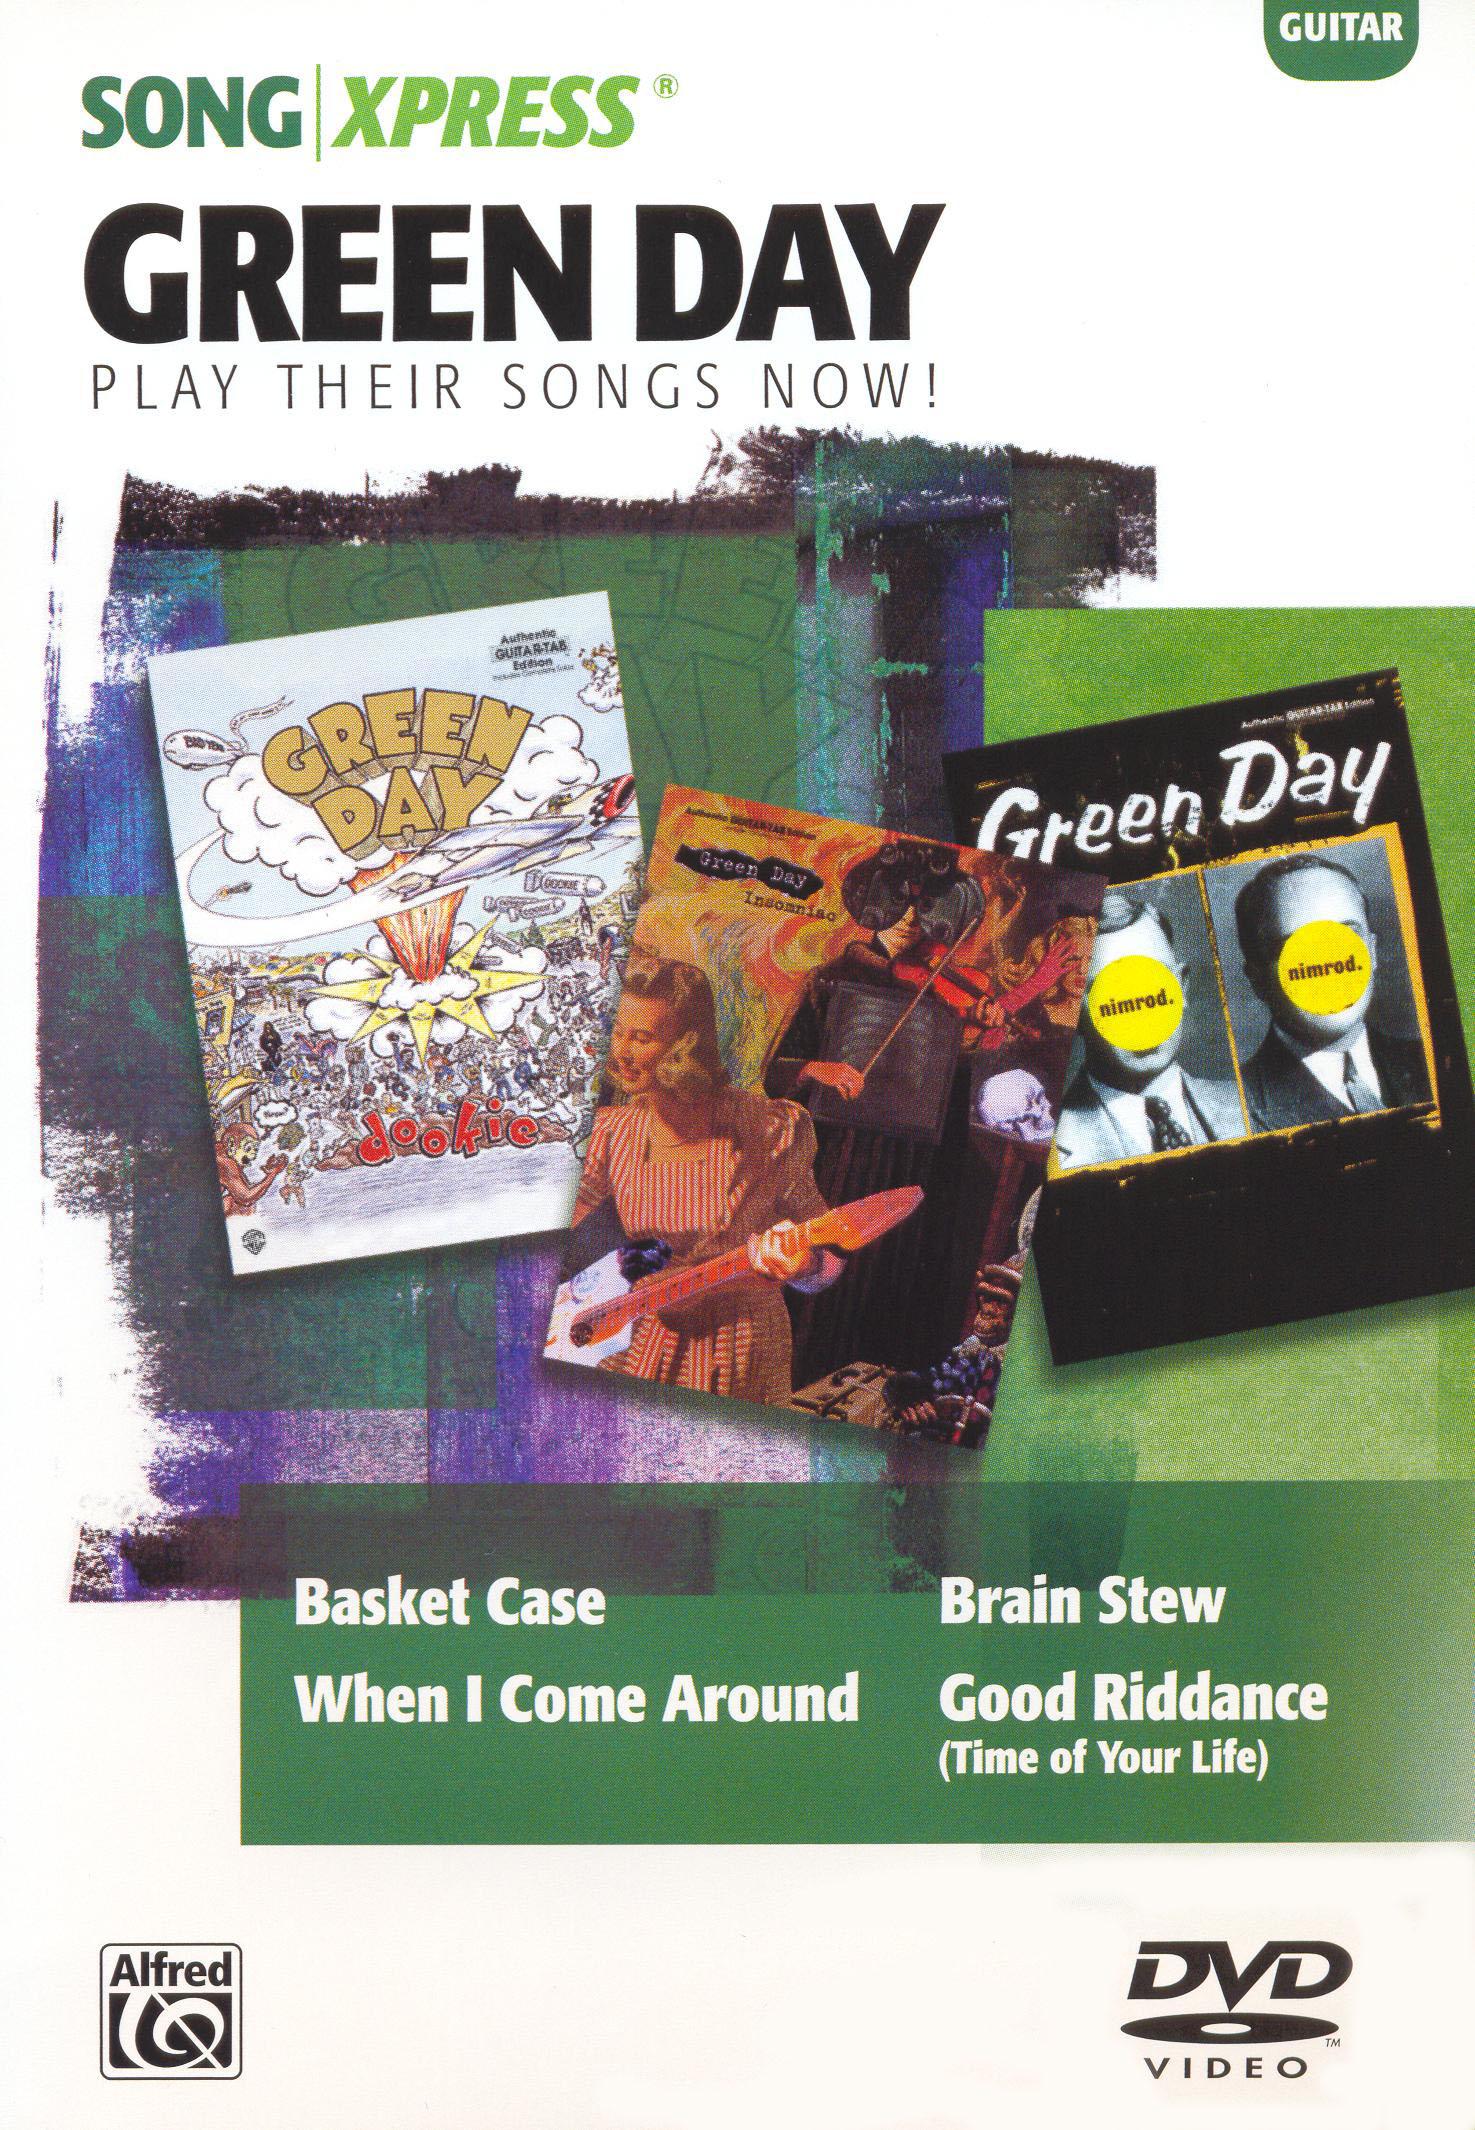 SongXpress: Green Day